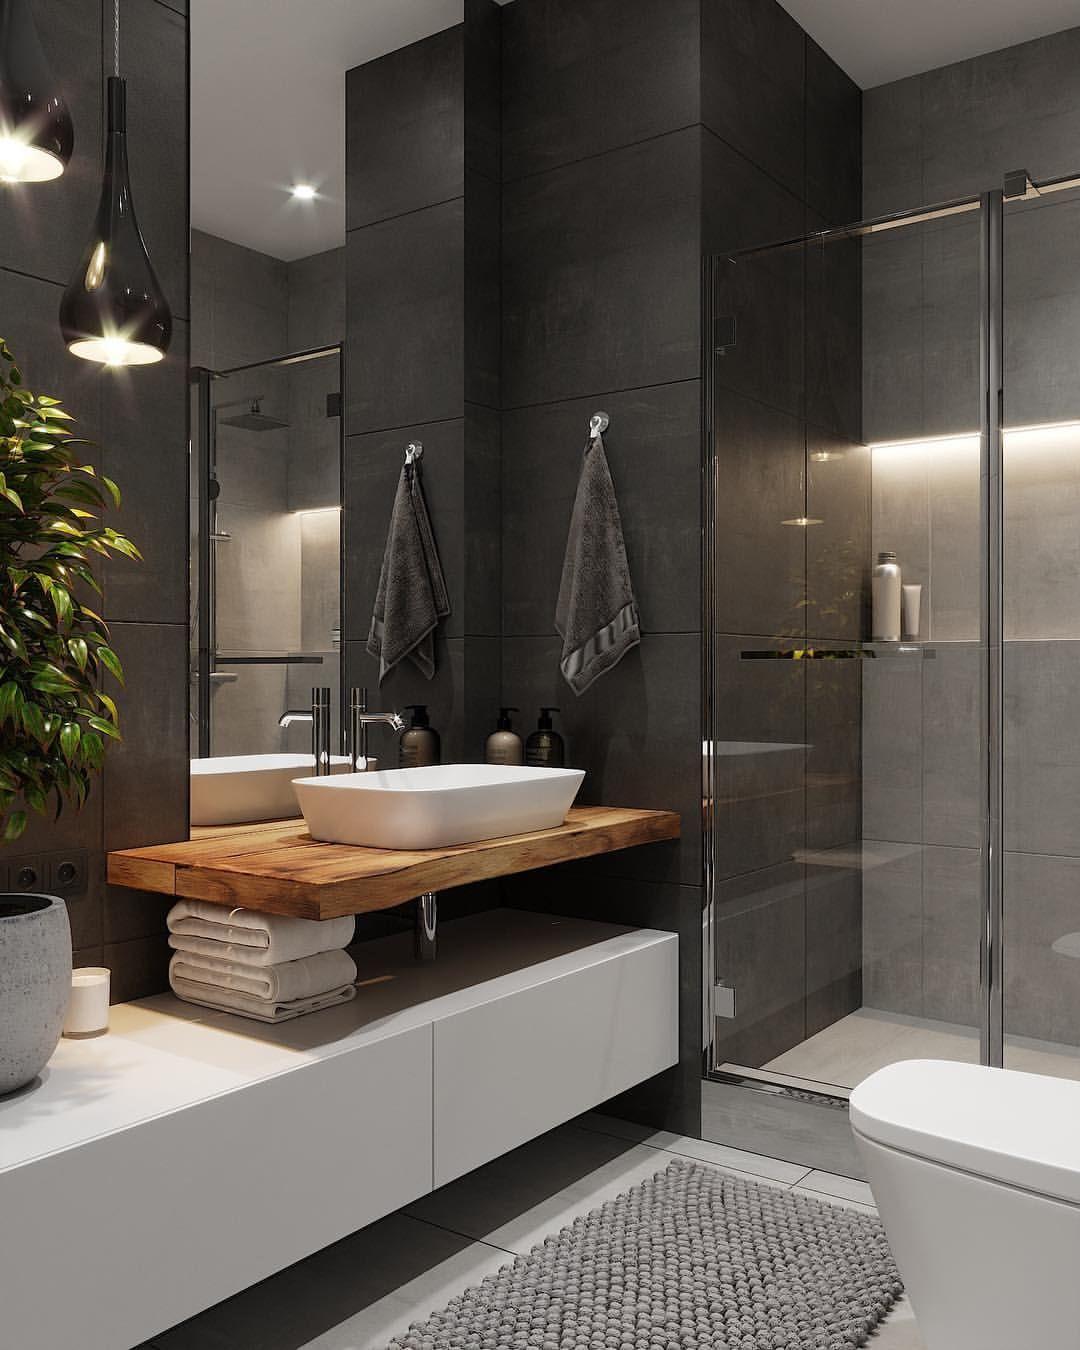 Tyomnaya Vannaya Komnata S Prozrachnoj Dushevoj Kabinkoj In Dcr Design Interior Interio Bathroom Design Black Modern Bathroom Design Bathroom Interior Design